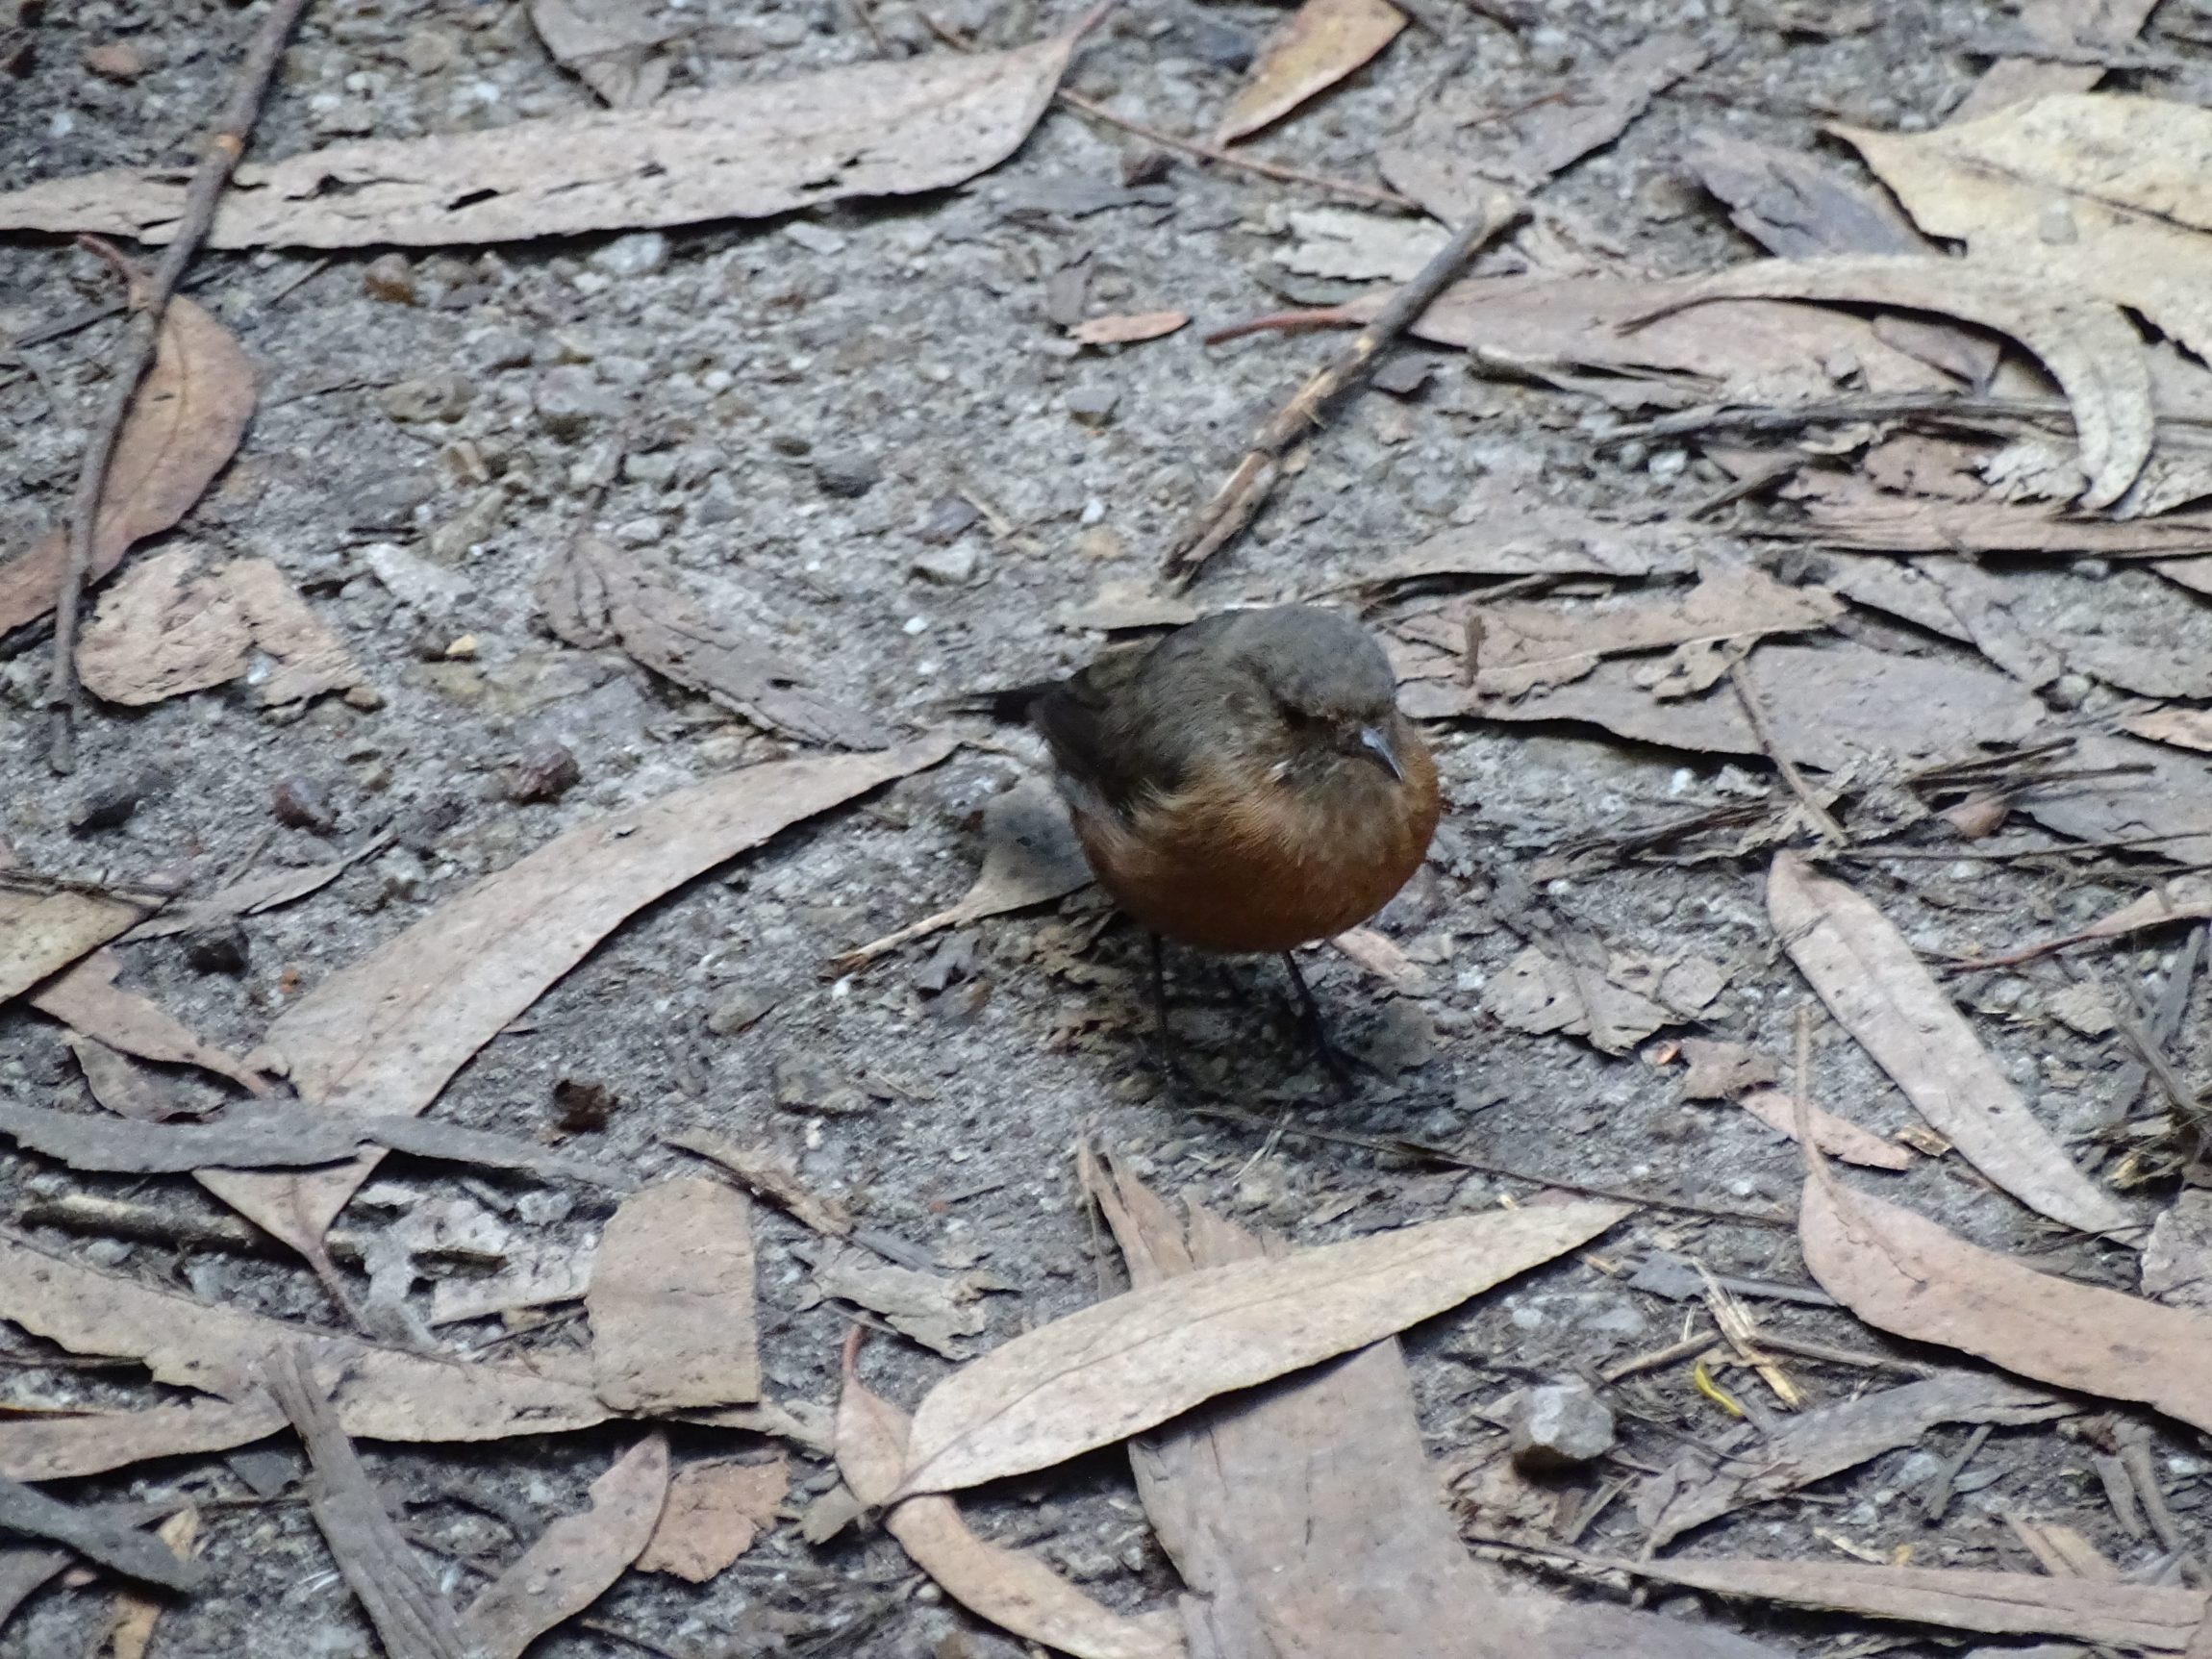 Rock warbler / Origma (Origma solitaria)